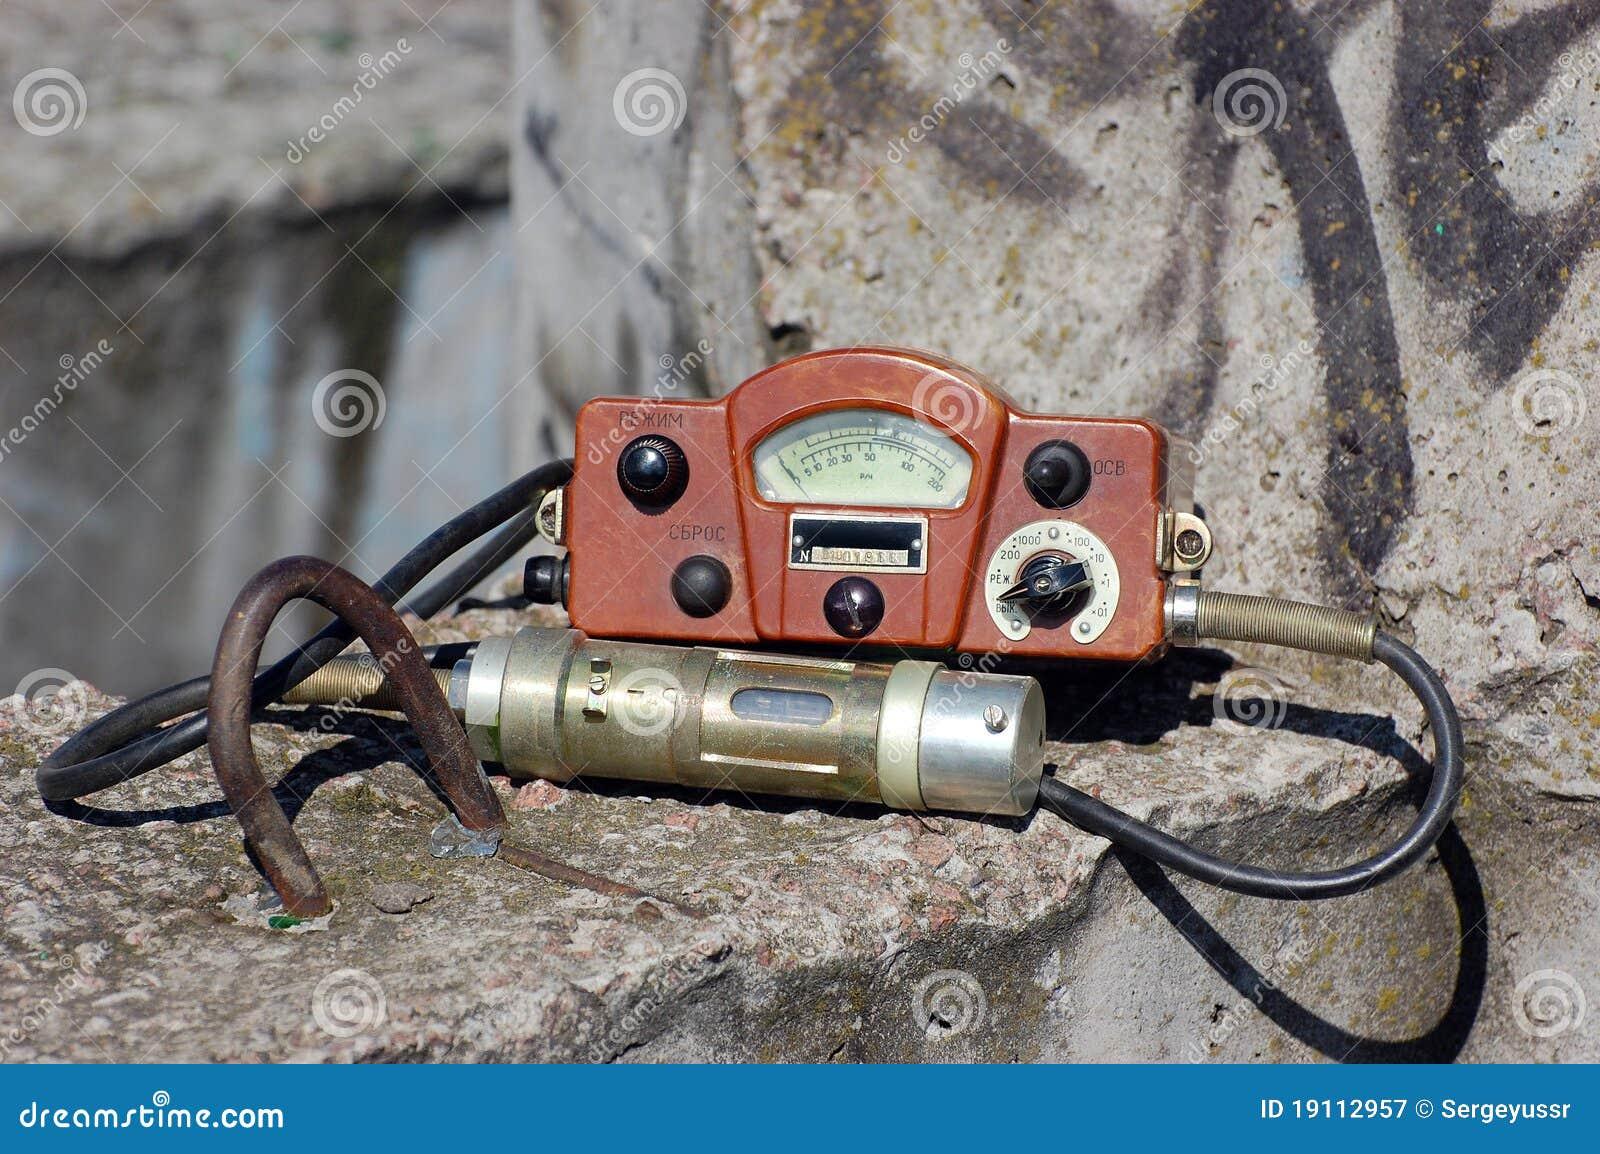 Radiometer Royalty Free Stock Photography - Image: 19112957